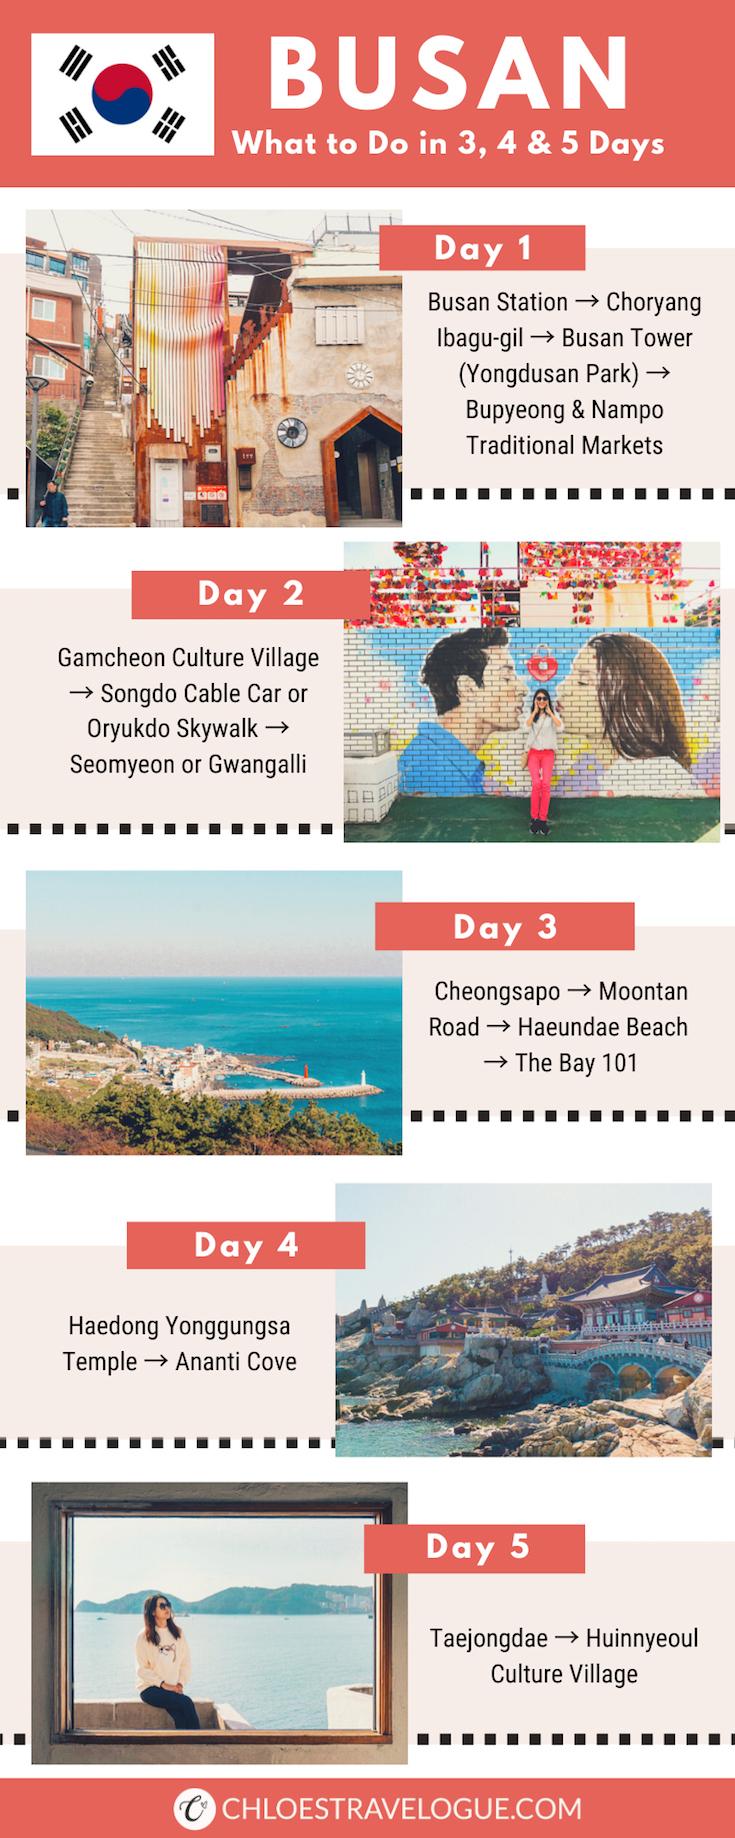 Busan Itinerary 5 Days (South Korea) | Infographic - What to do in Busan for 3-5 days | #BusanItinerary #Busan #Korea #SouthKorea #AsiaTravel #KoreaTravel #ThingstoDo #Whattodo #BusanAttractions #infographic #Itinerary